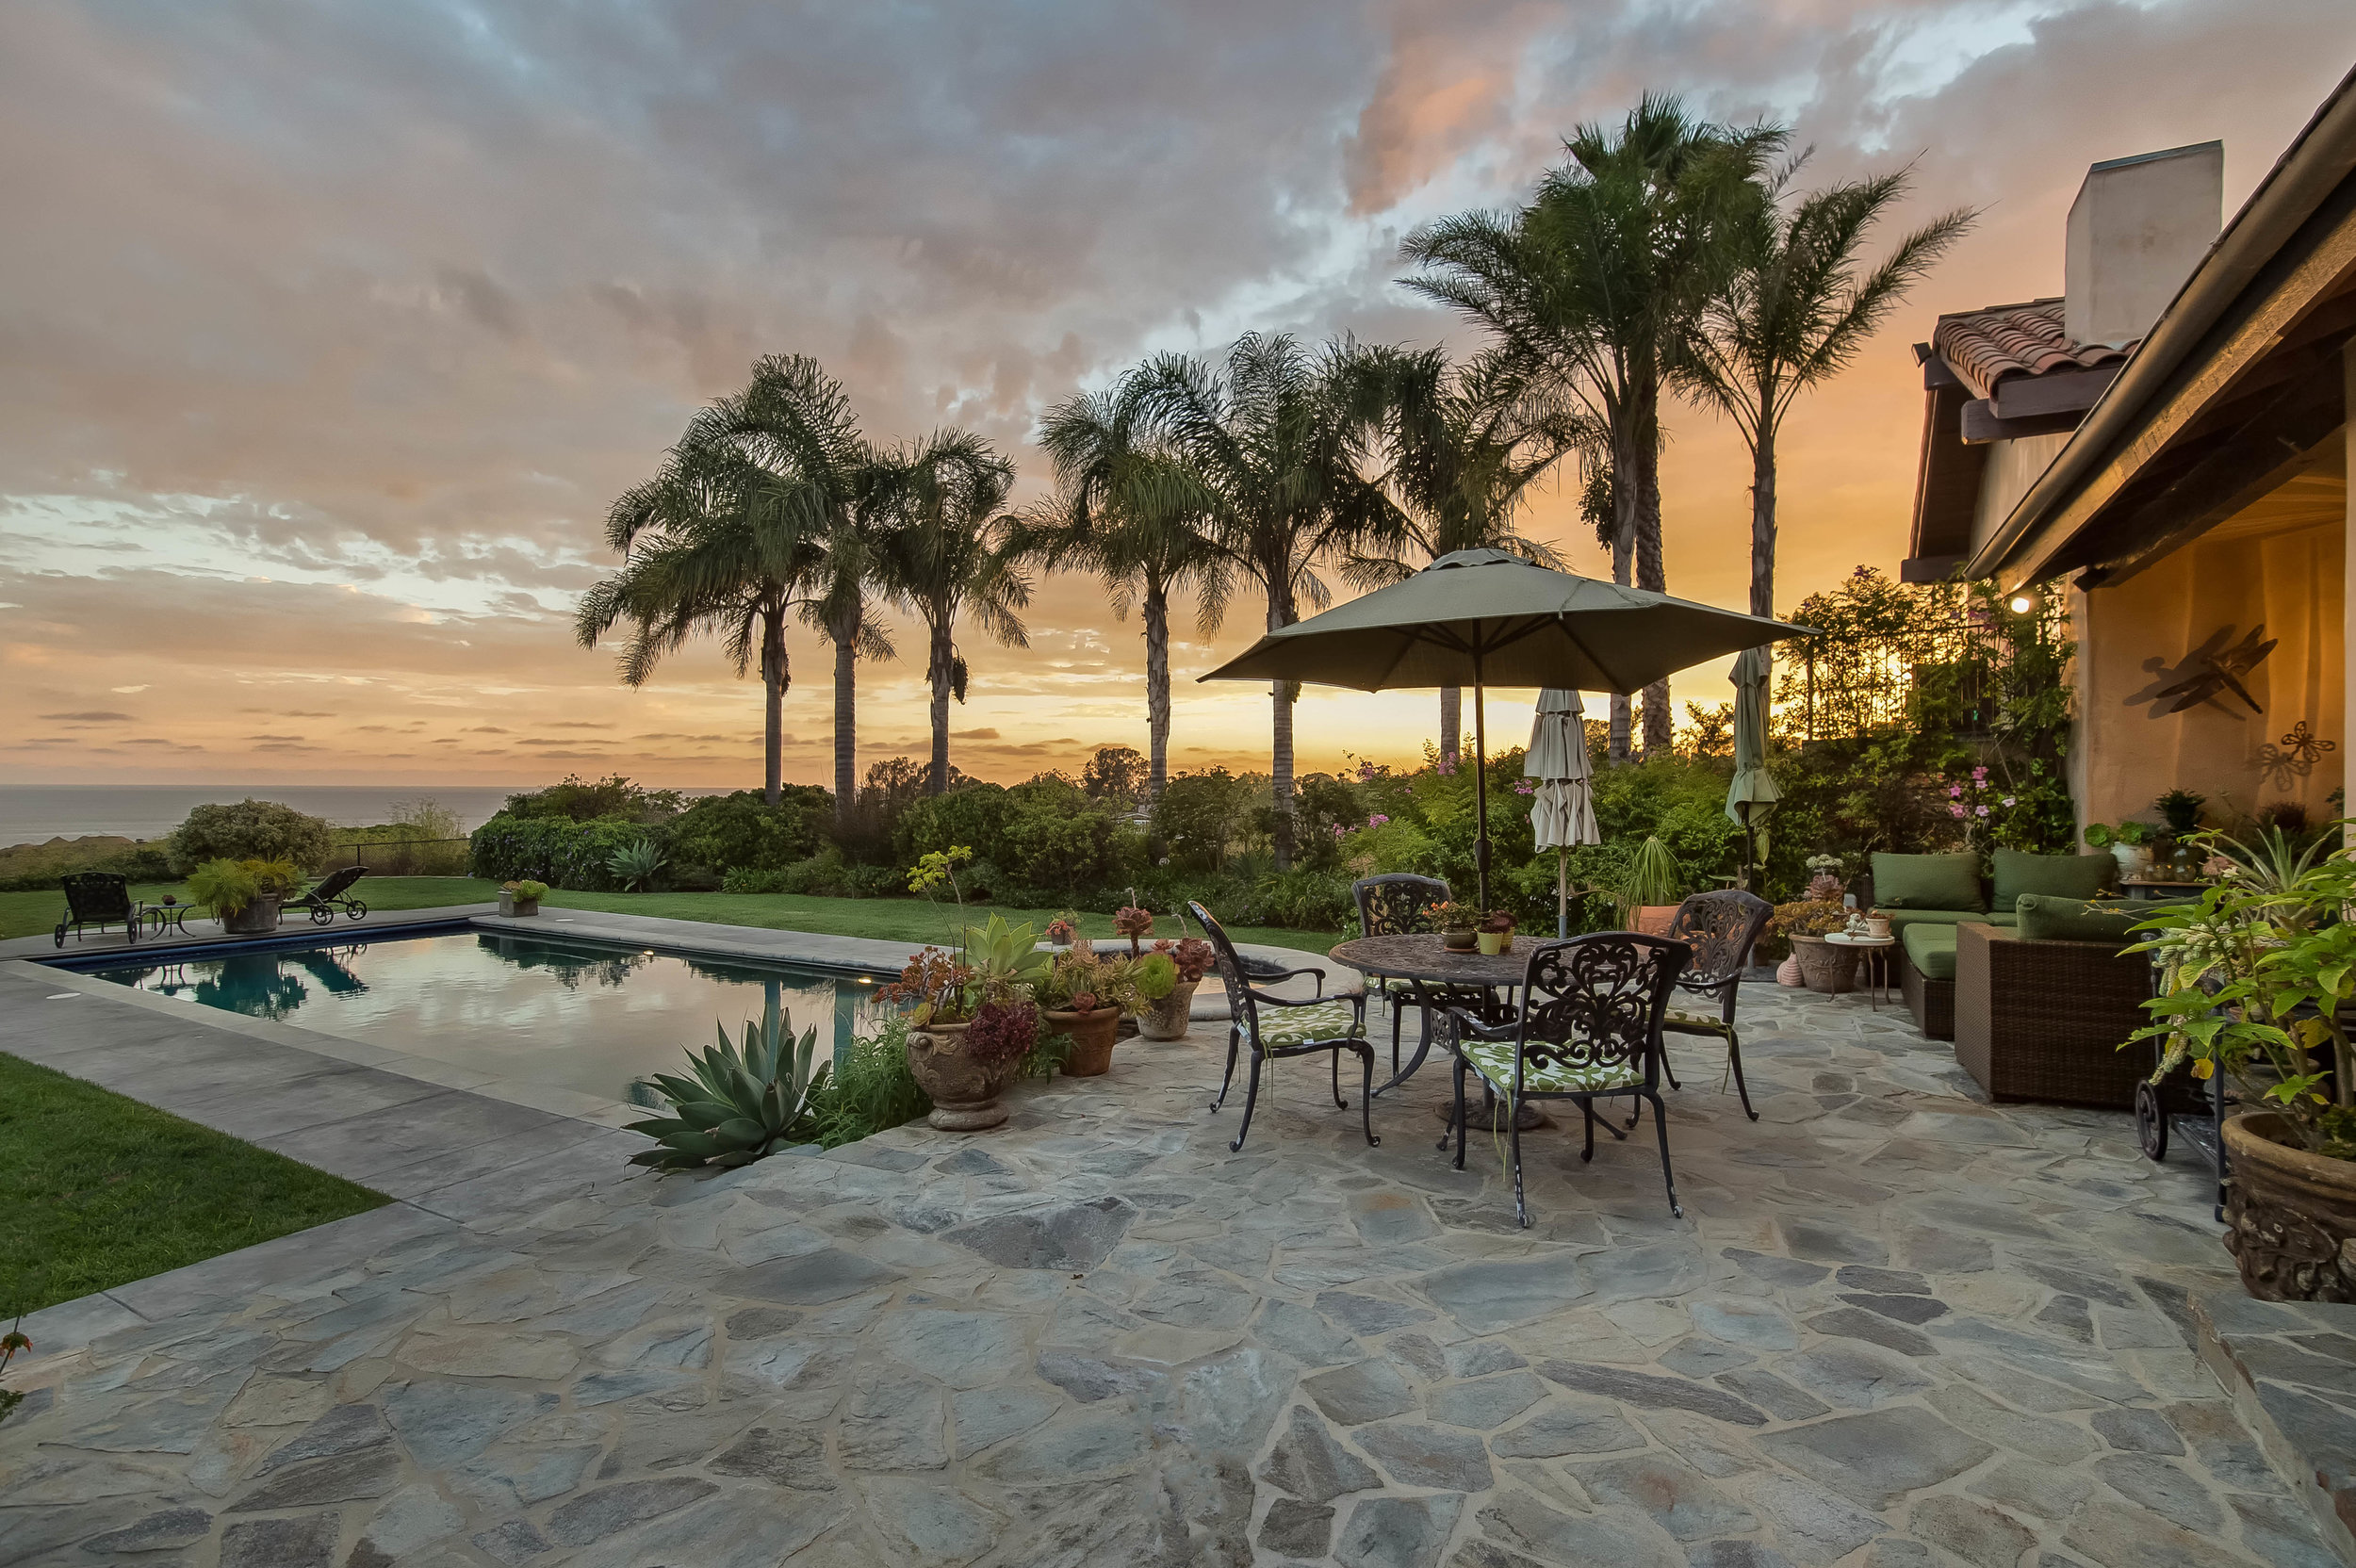 001 pool twilight ocean view 29660 Harvester Road Malibu For Sale The Malibu Life Team Luxury Real Estate.jpg